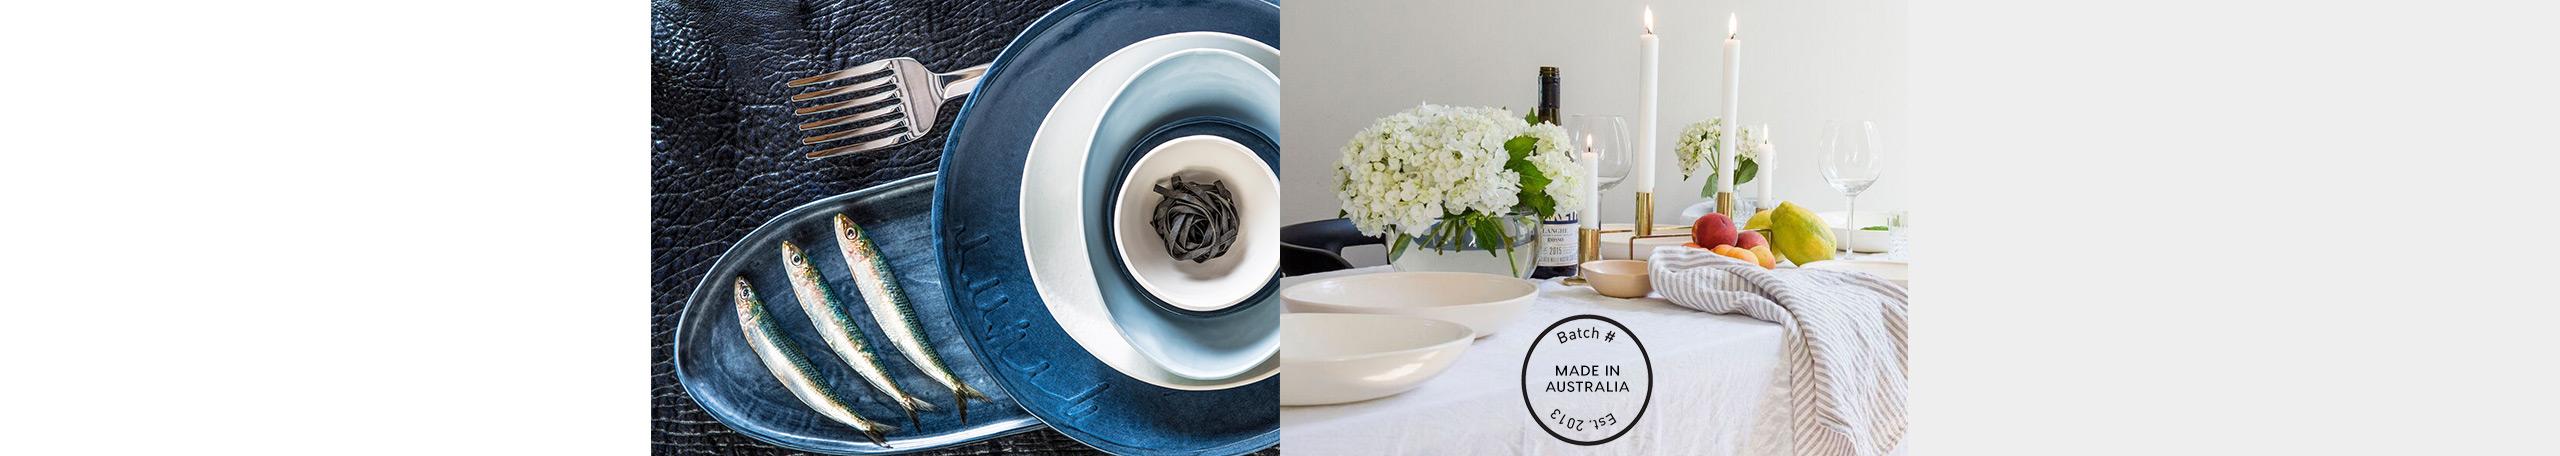 Batch Dinnerware & Servingware